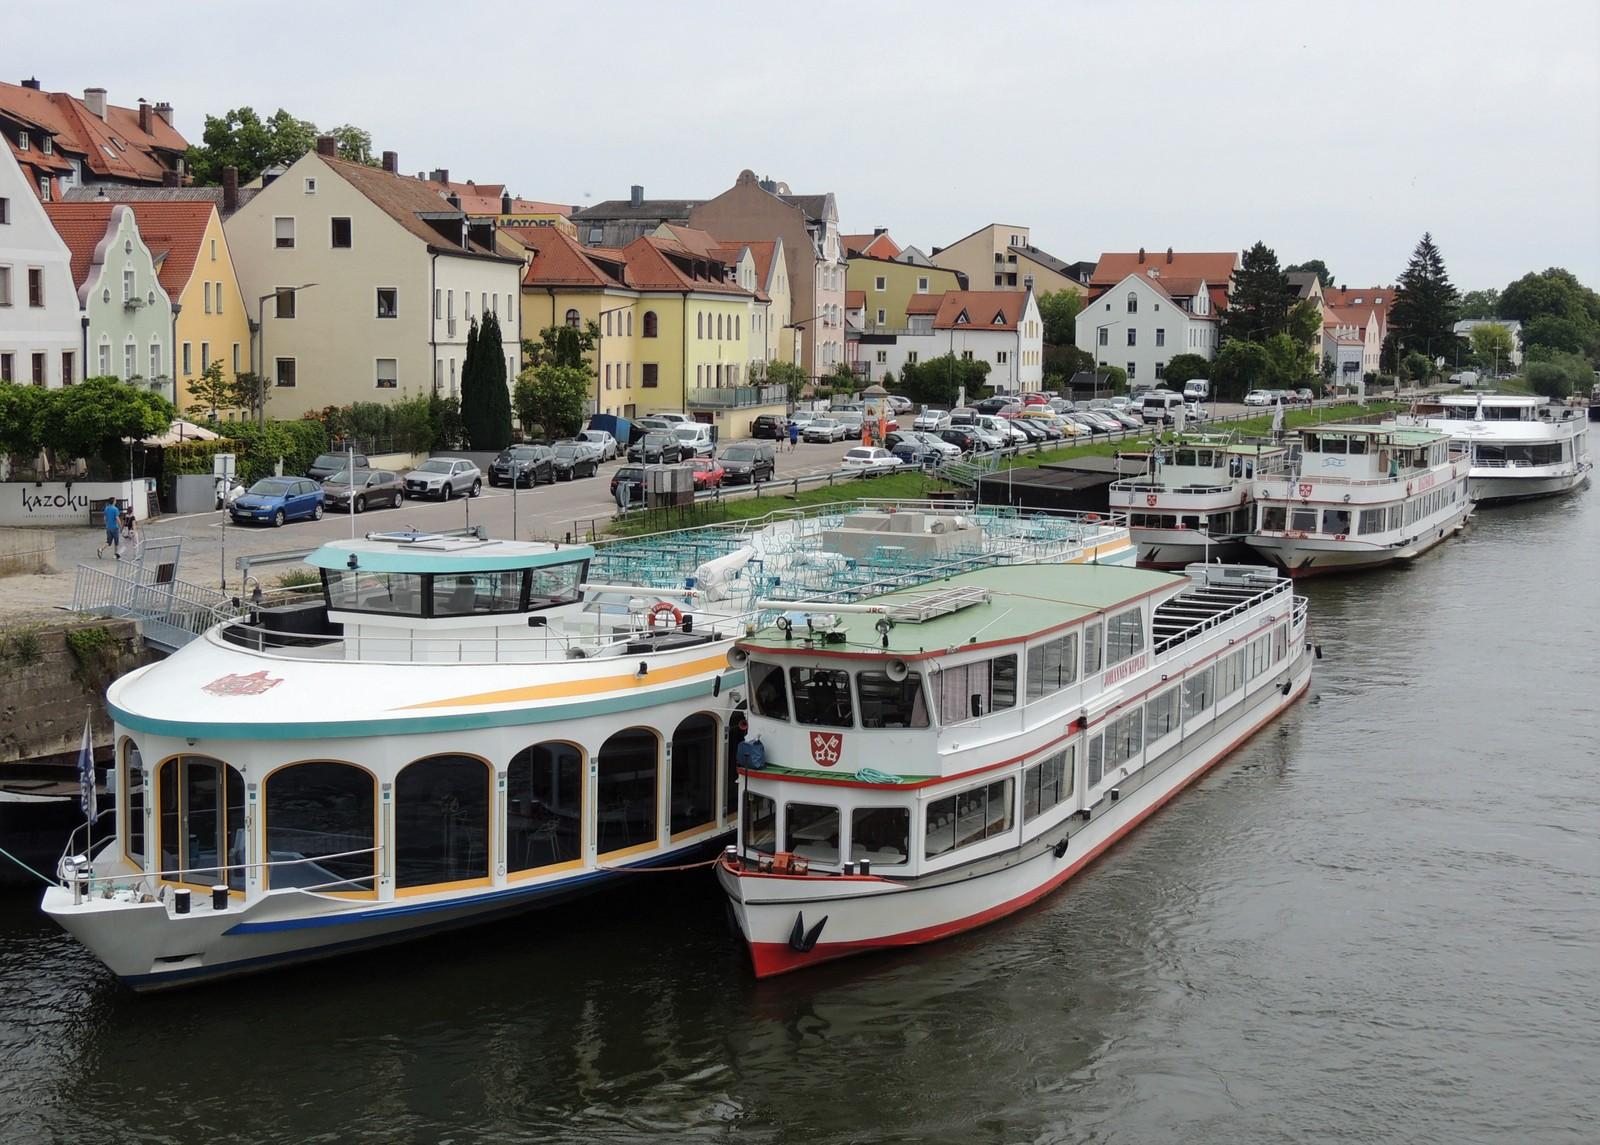 Regensburg - Unter Wöhrd - Werftstraße